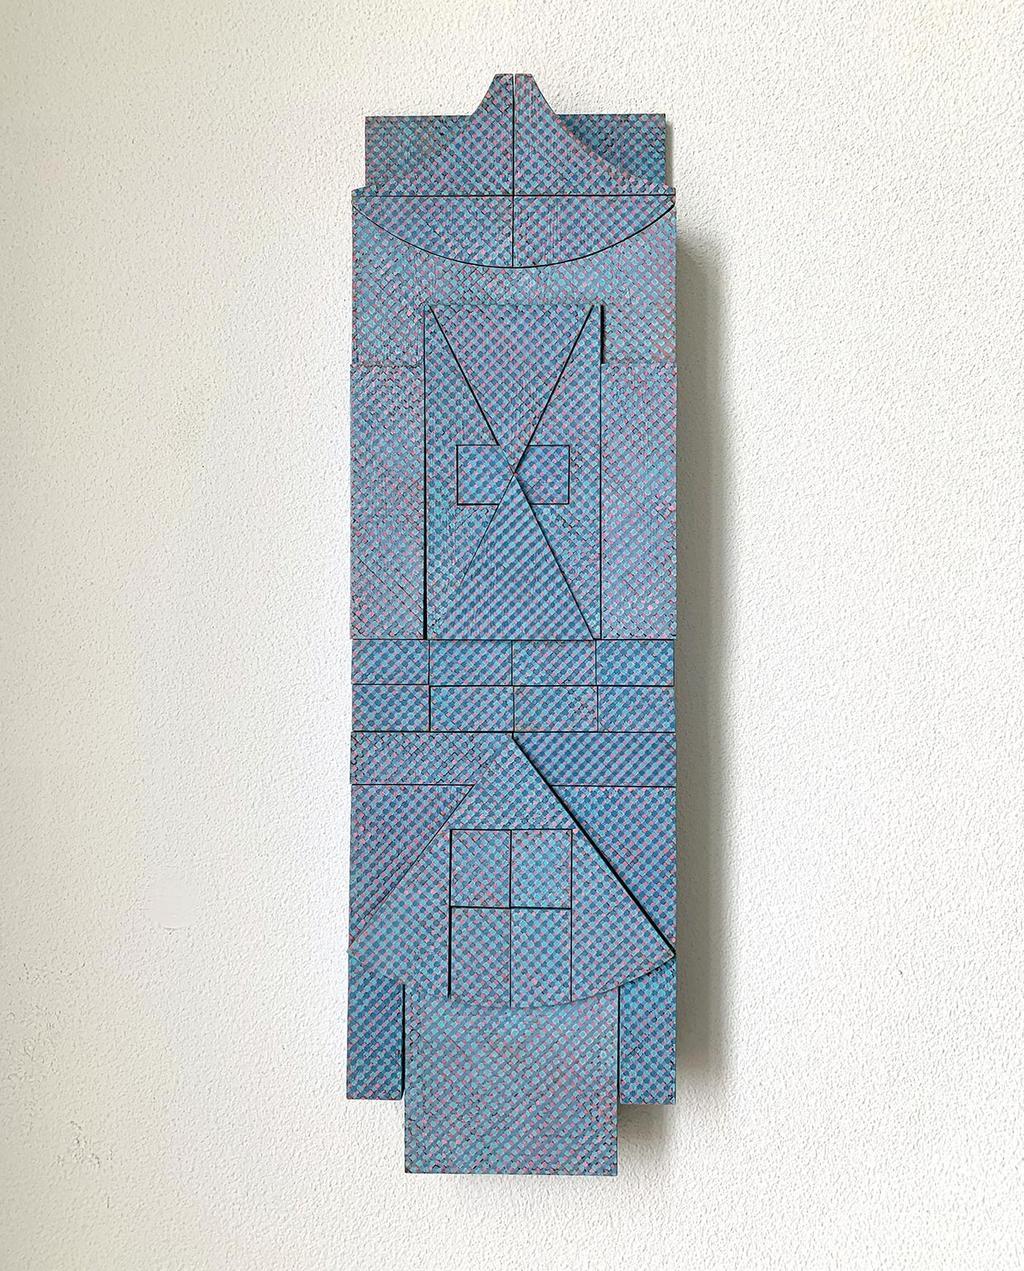 vtwonen 09-2020 | blauw 3d kunstwerk